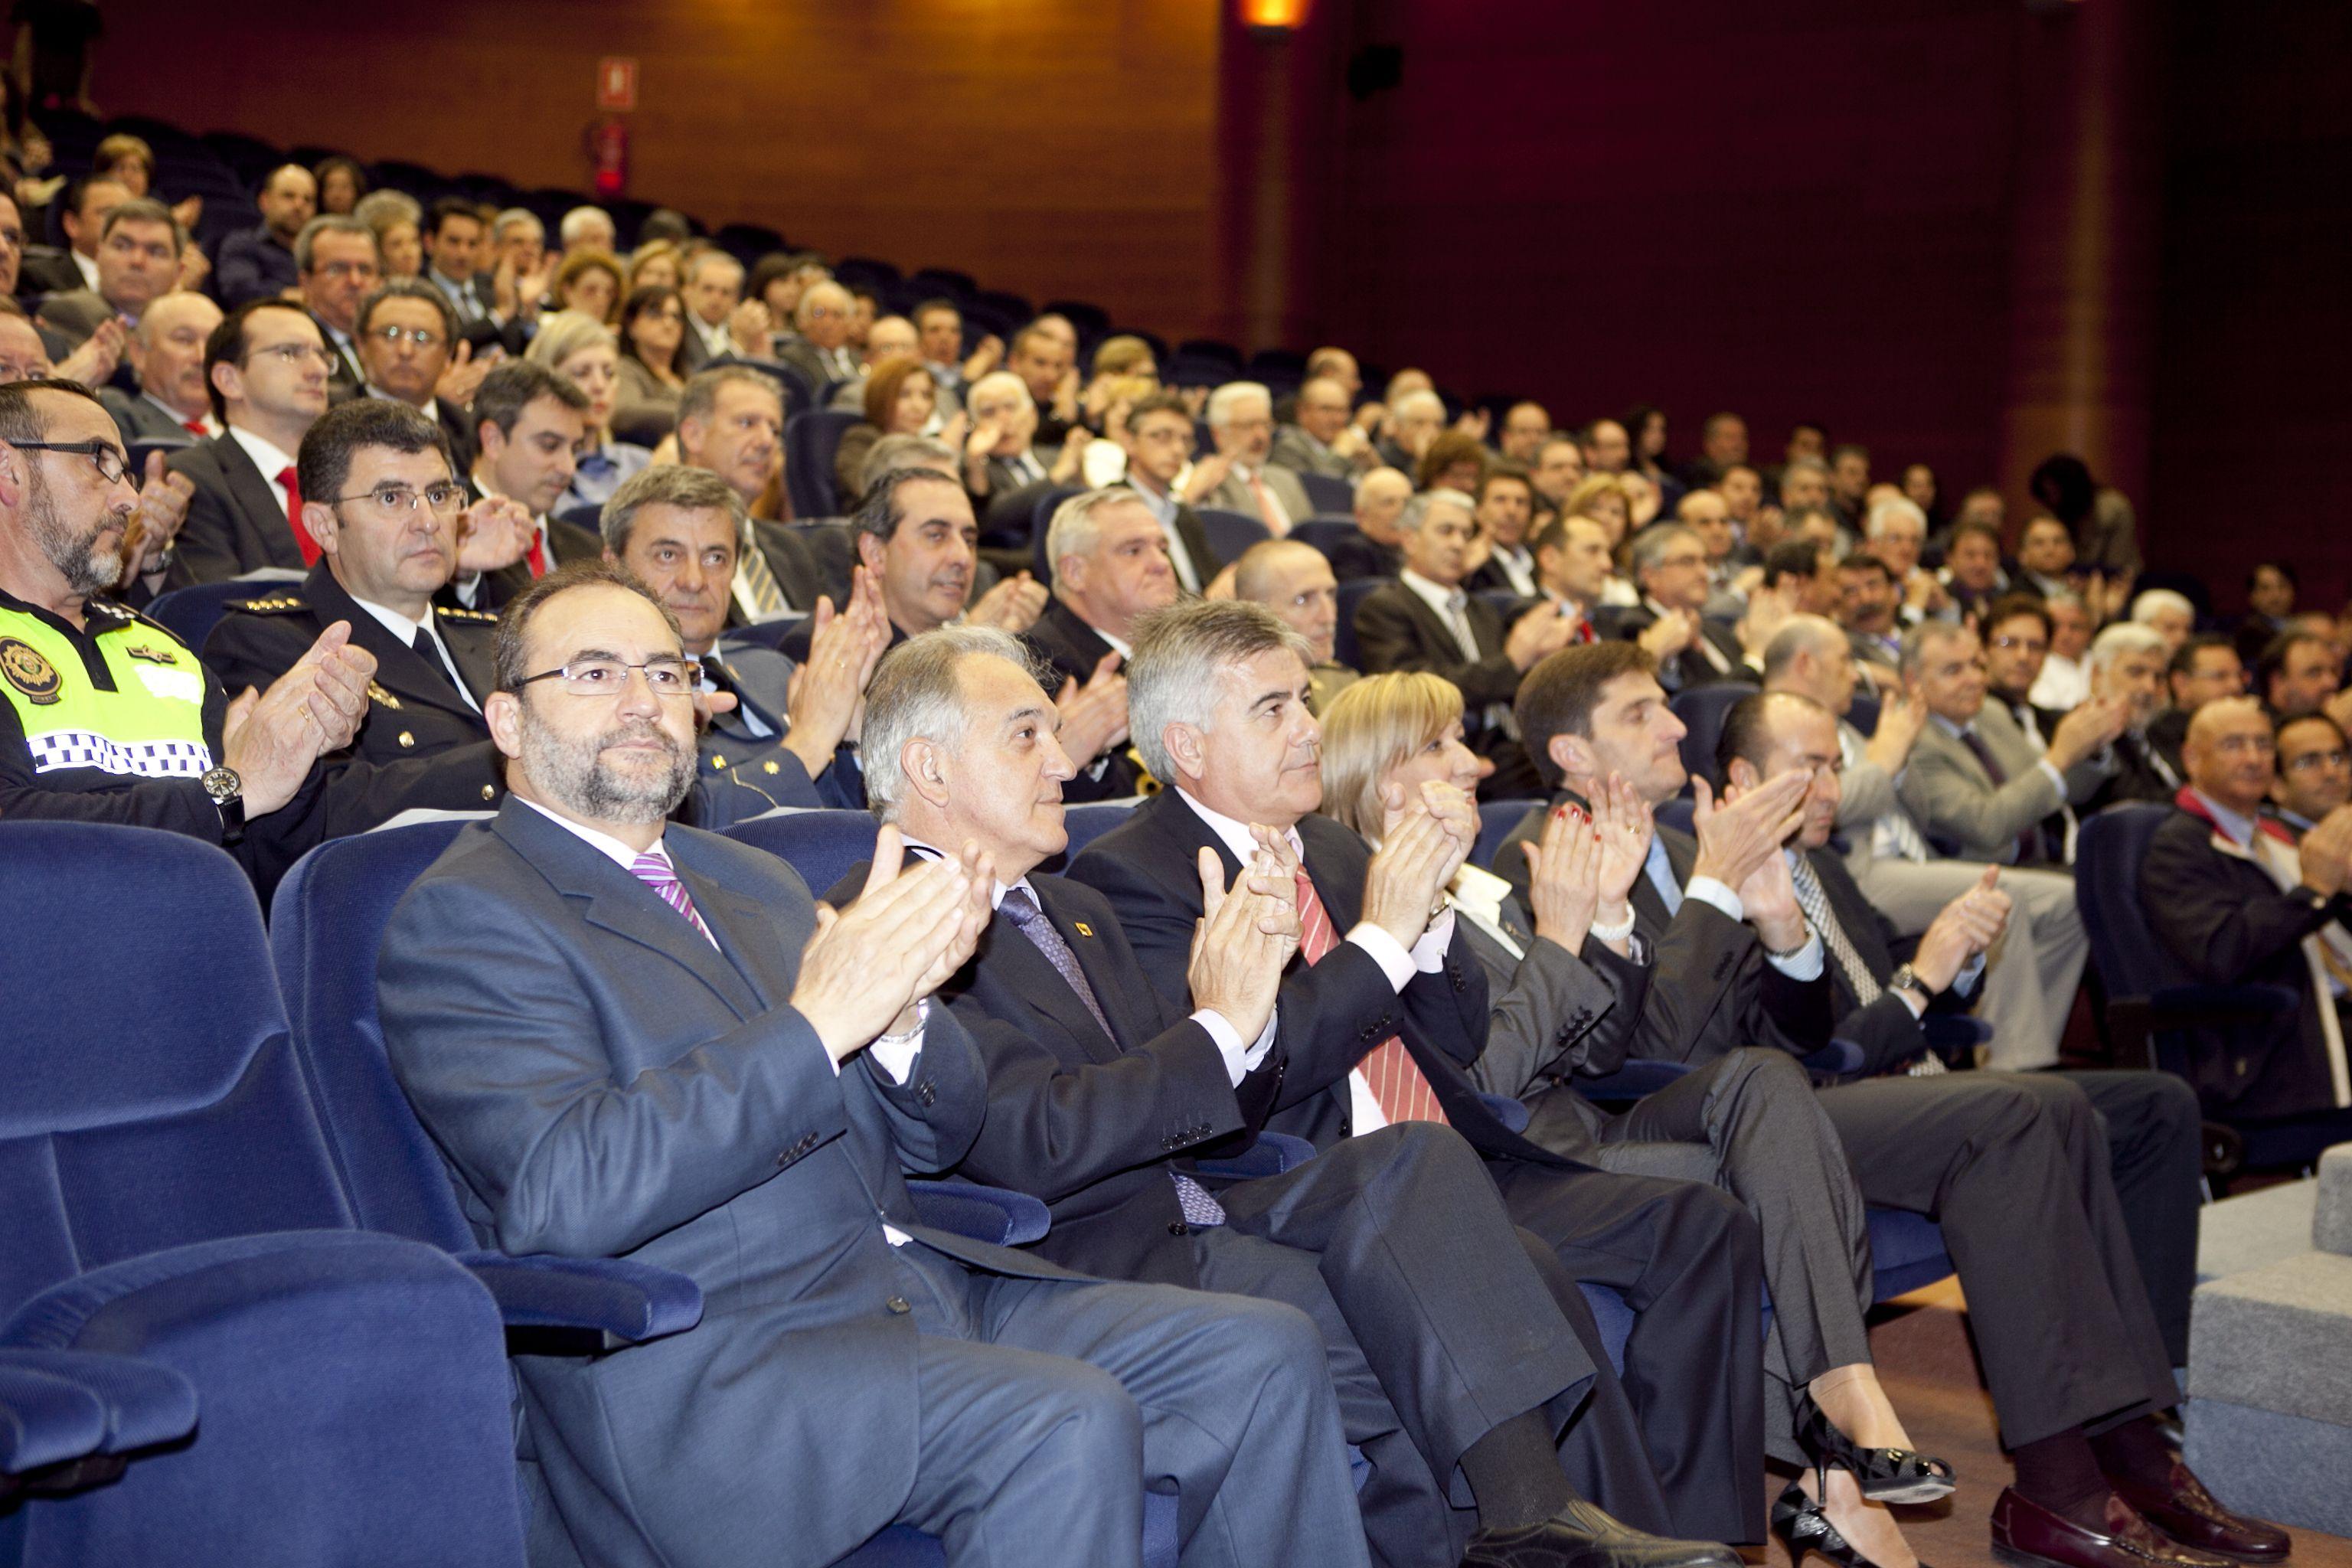 umh-diplomas-rector_mg_6451.jpg